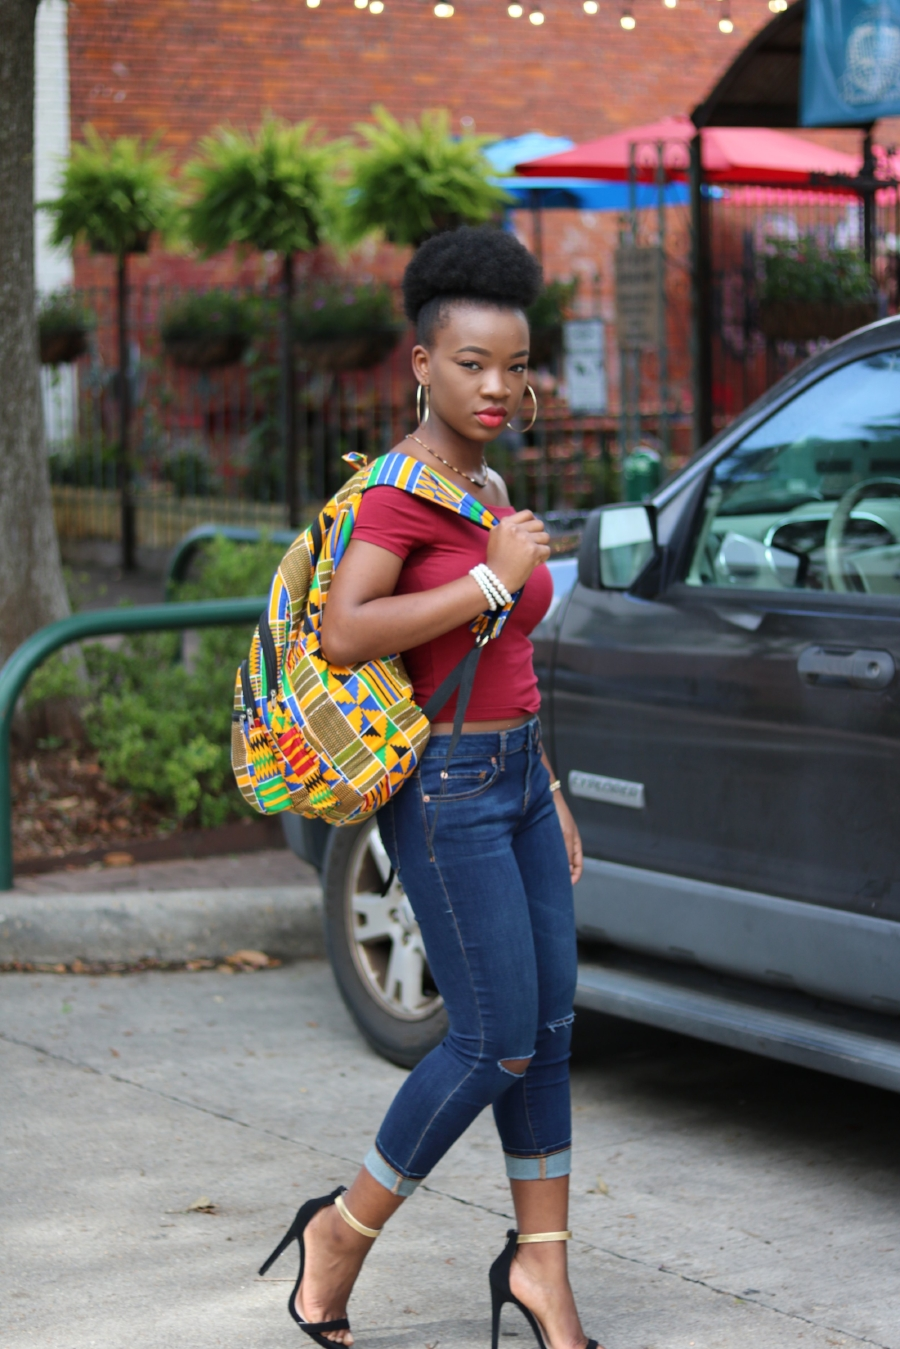 skinny jeans on black woman